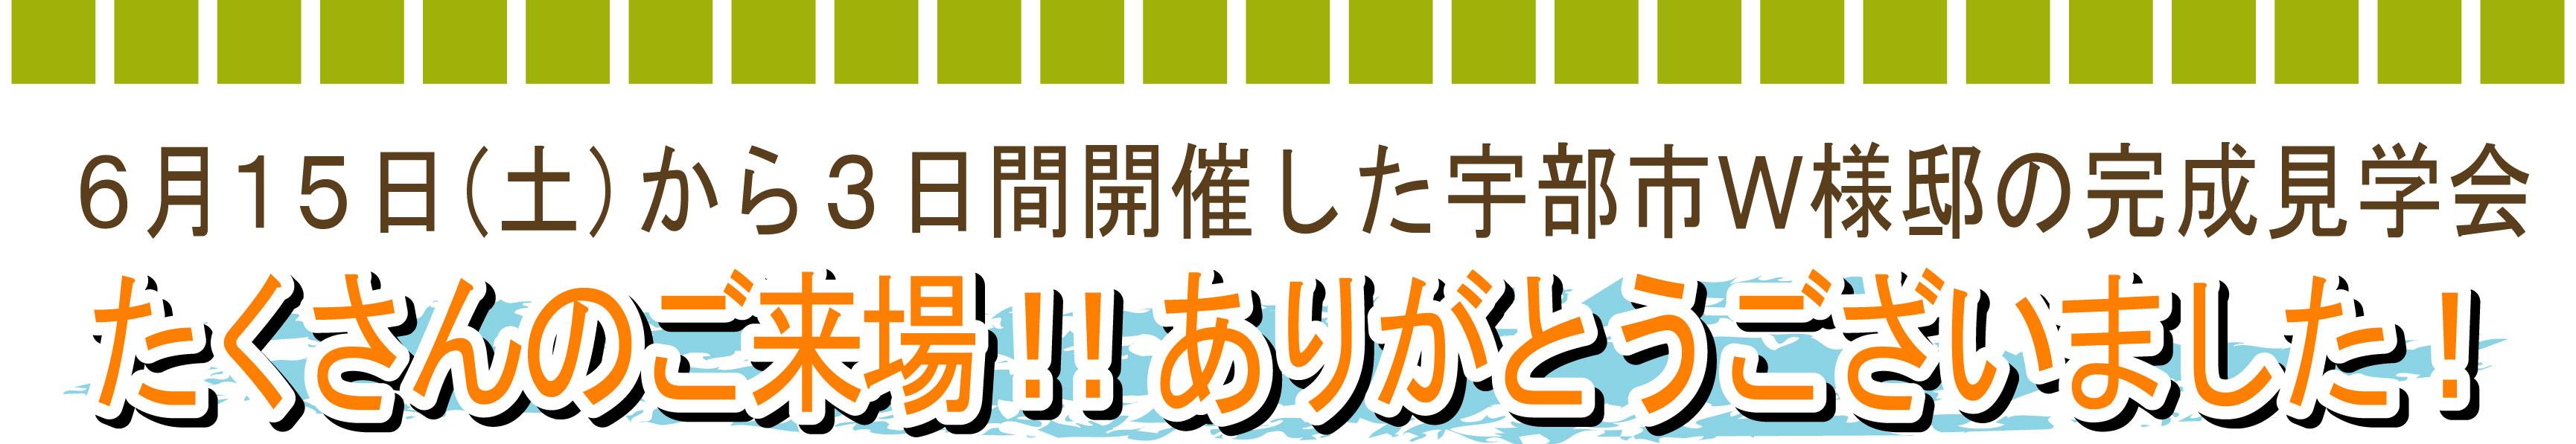 KuraSi-natu-sin73-08.jpg